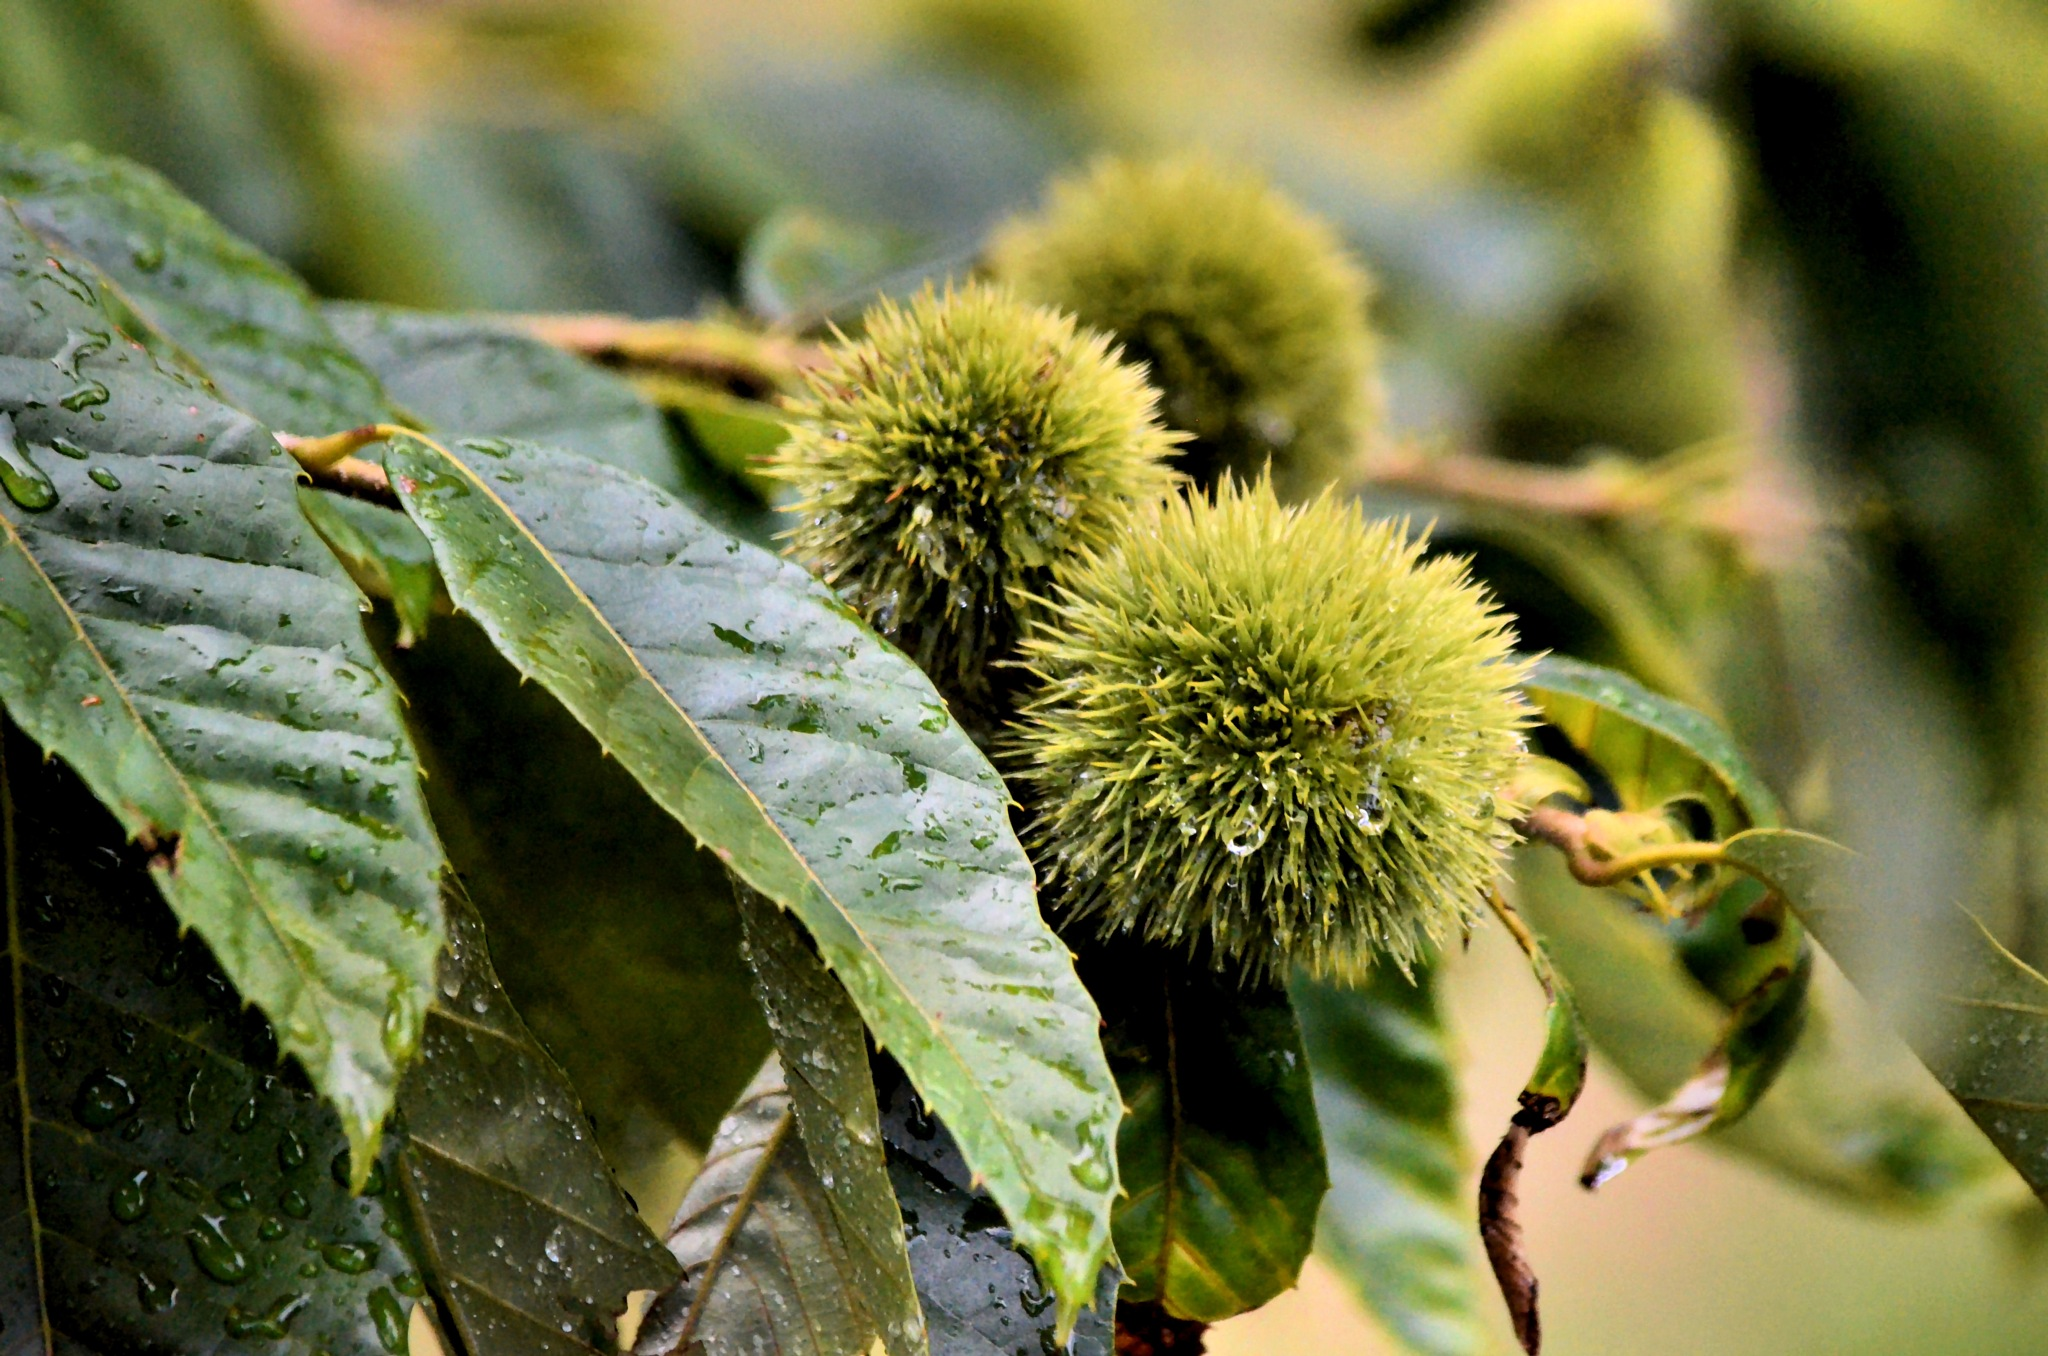 Chestnuts in the Rain by JimFleenor